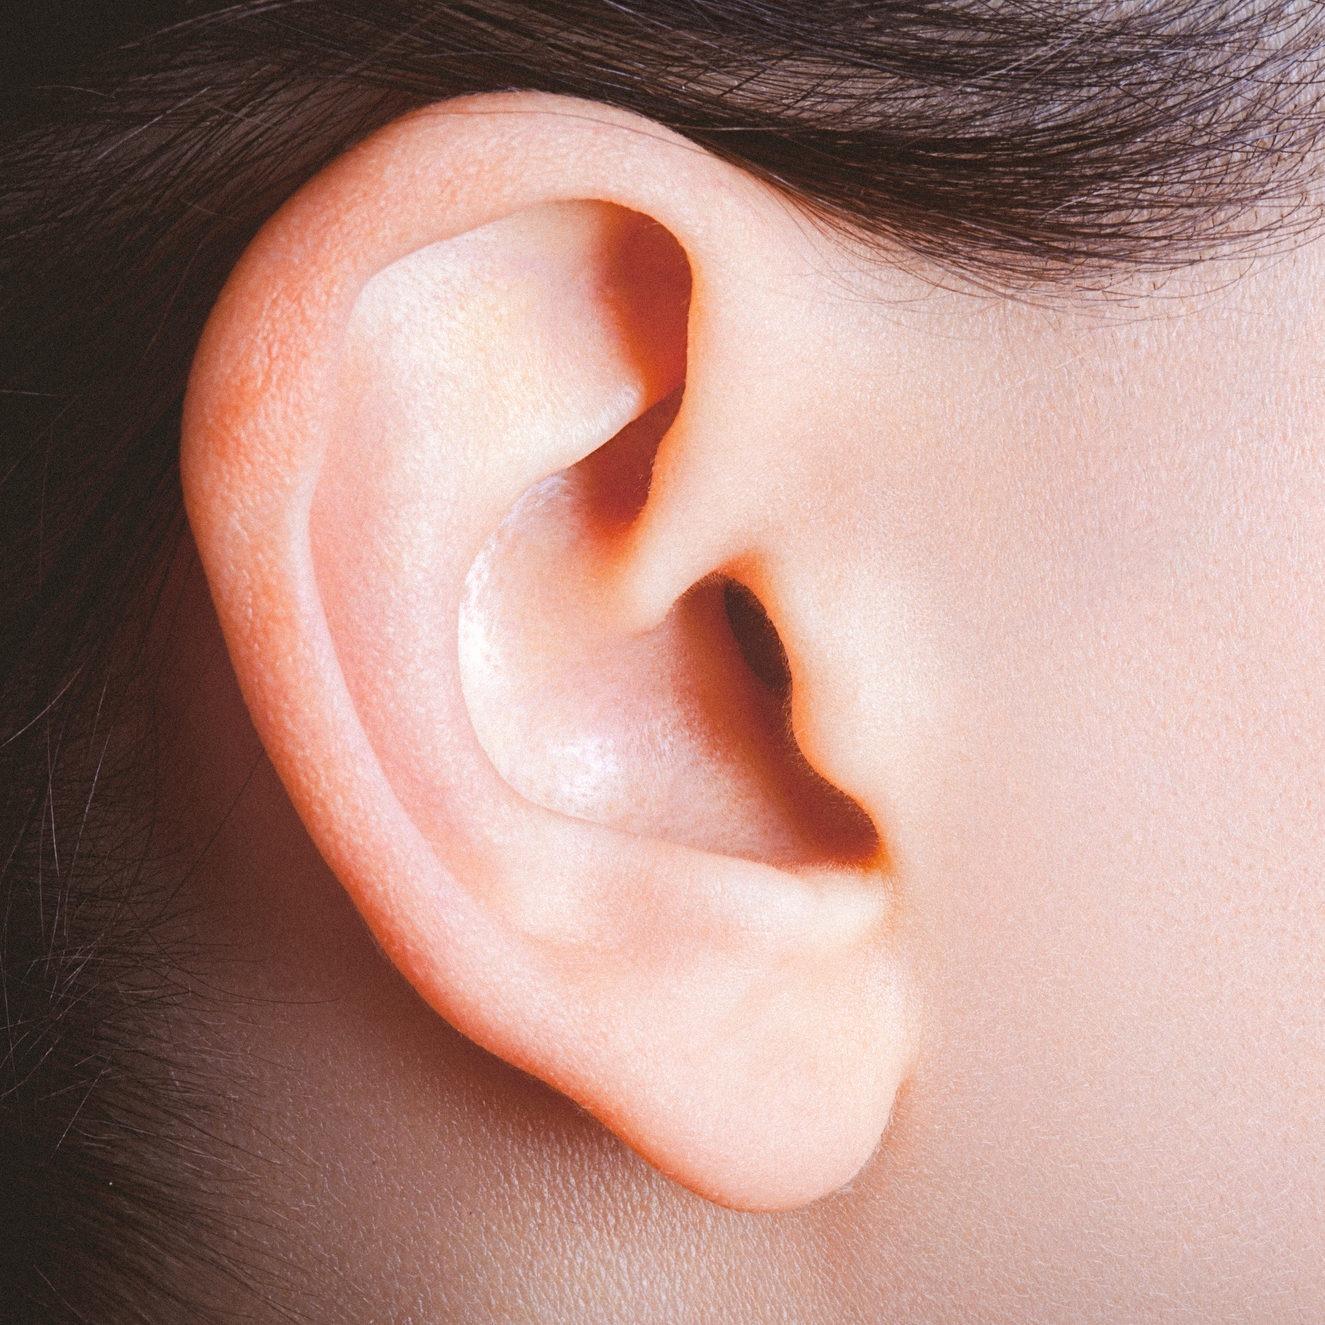 Fuentes Cosmetic Surgery Procedures Otoplasty